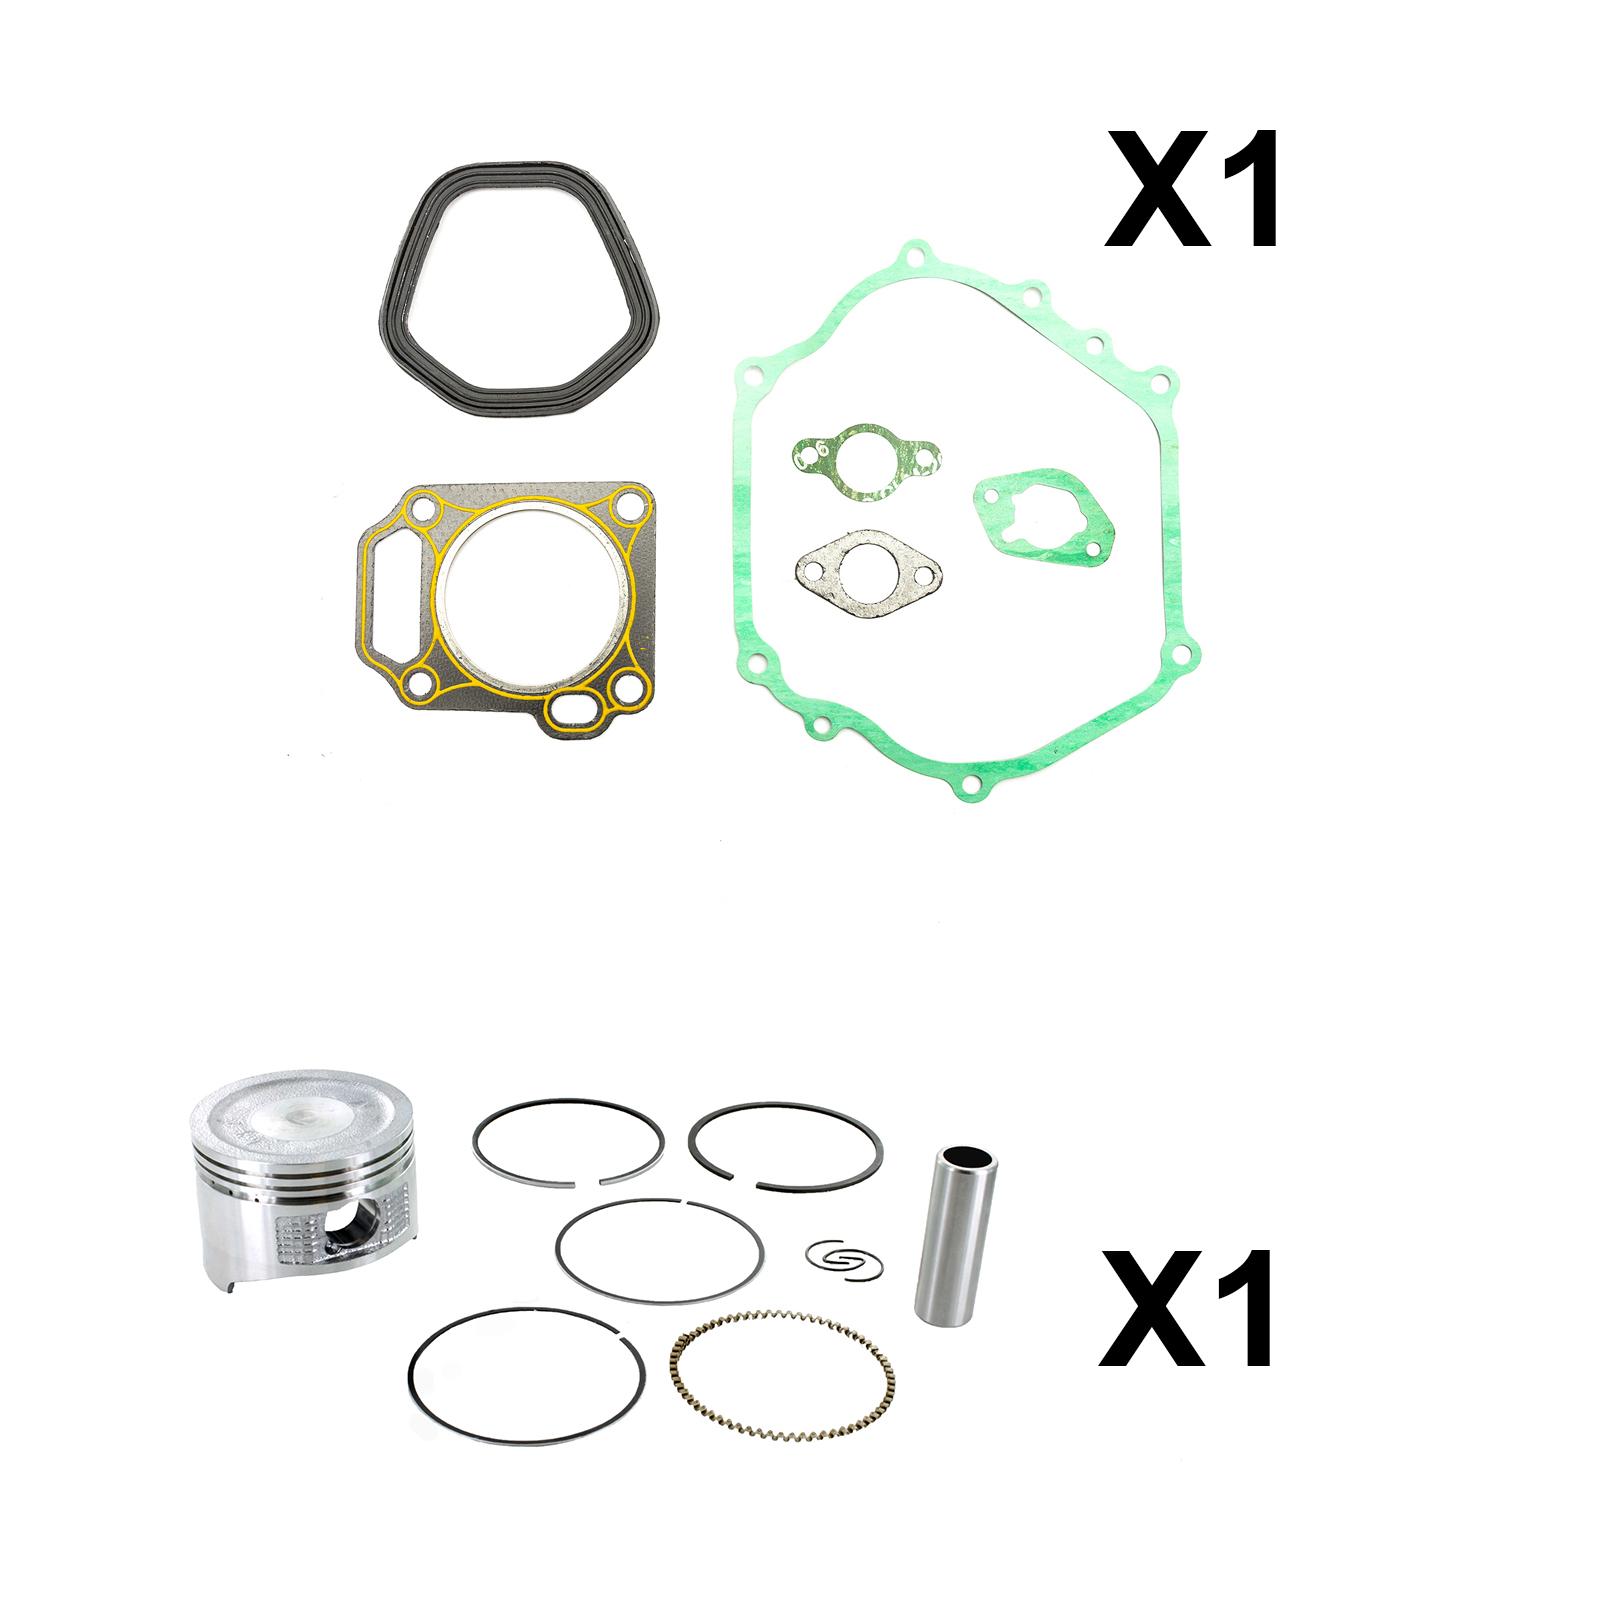 Non Genuine Piston Kit Complete Gasket Set Fits Honda